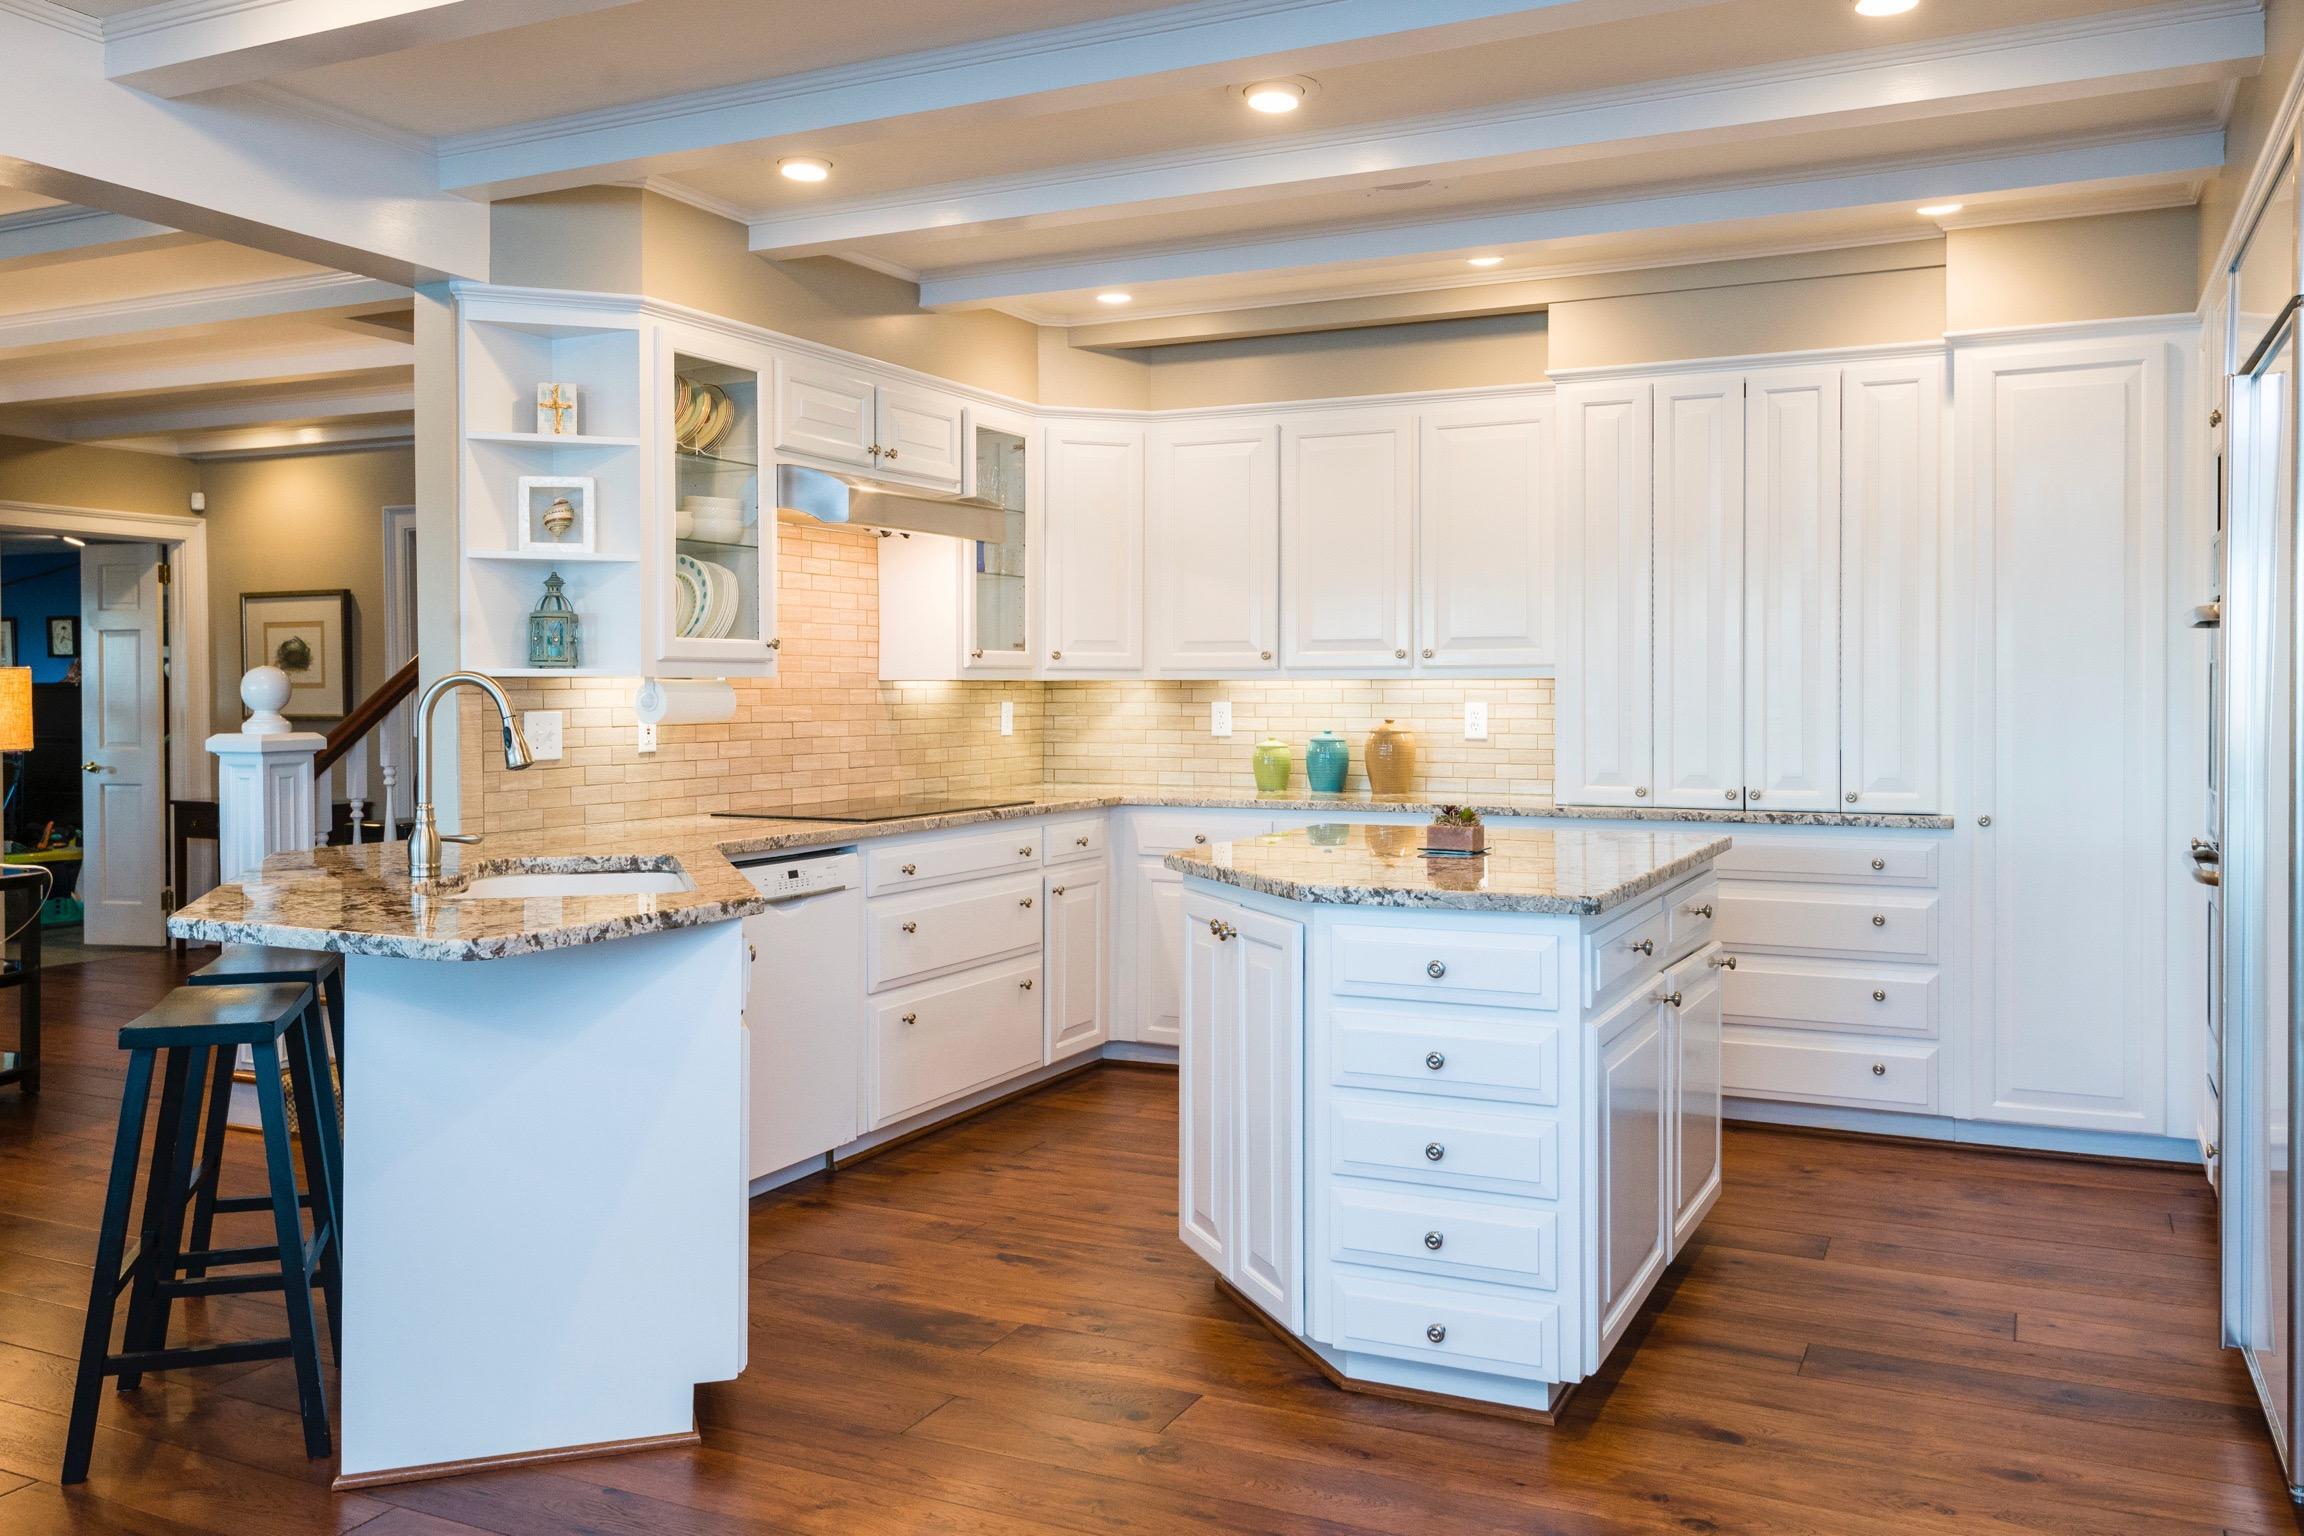 Lawton Bluff Homes For Sale - 685 Shore, Charleston, SC - 27